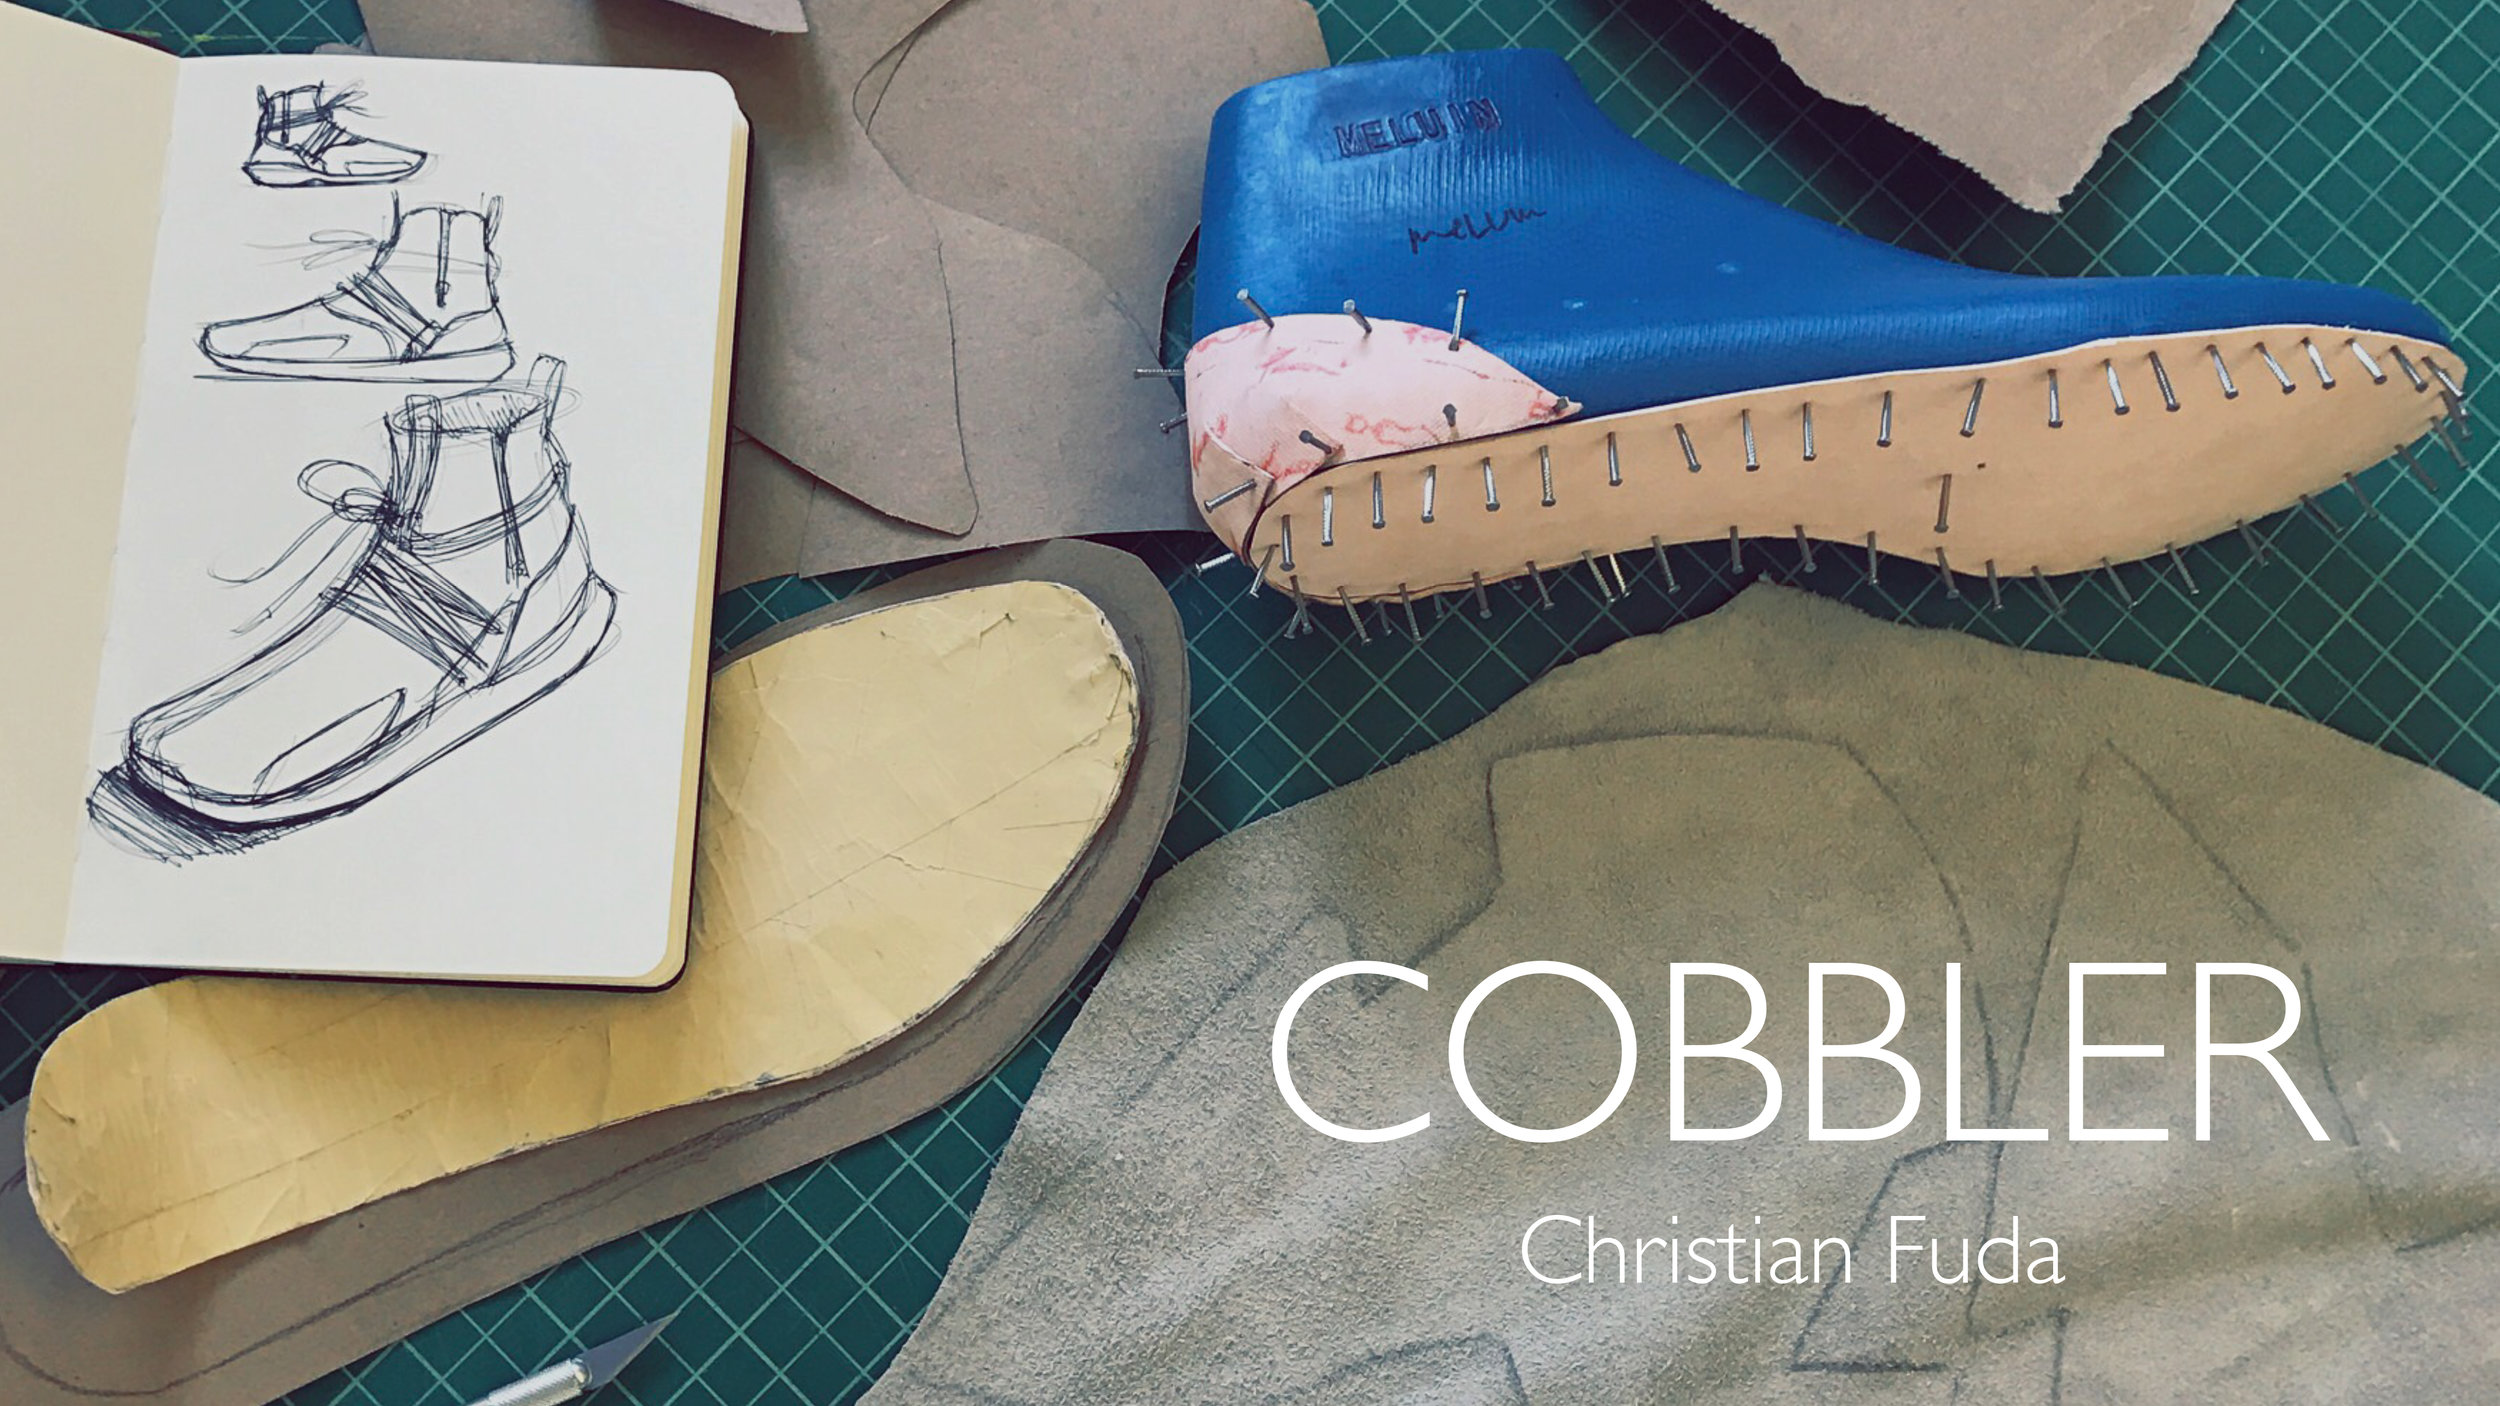 Fuda_Cobbler_Project-1.jpg